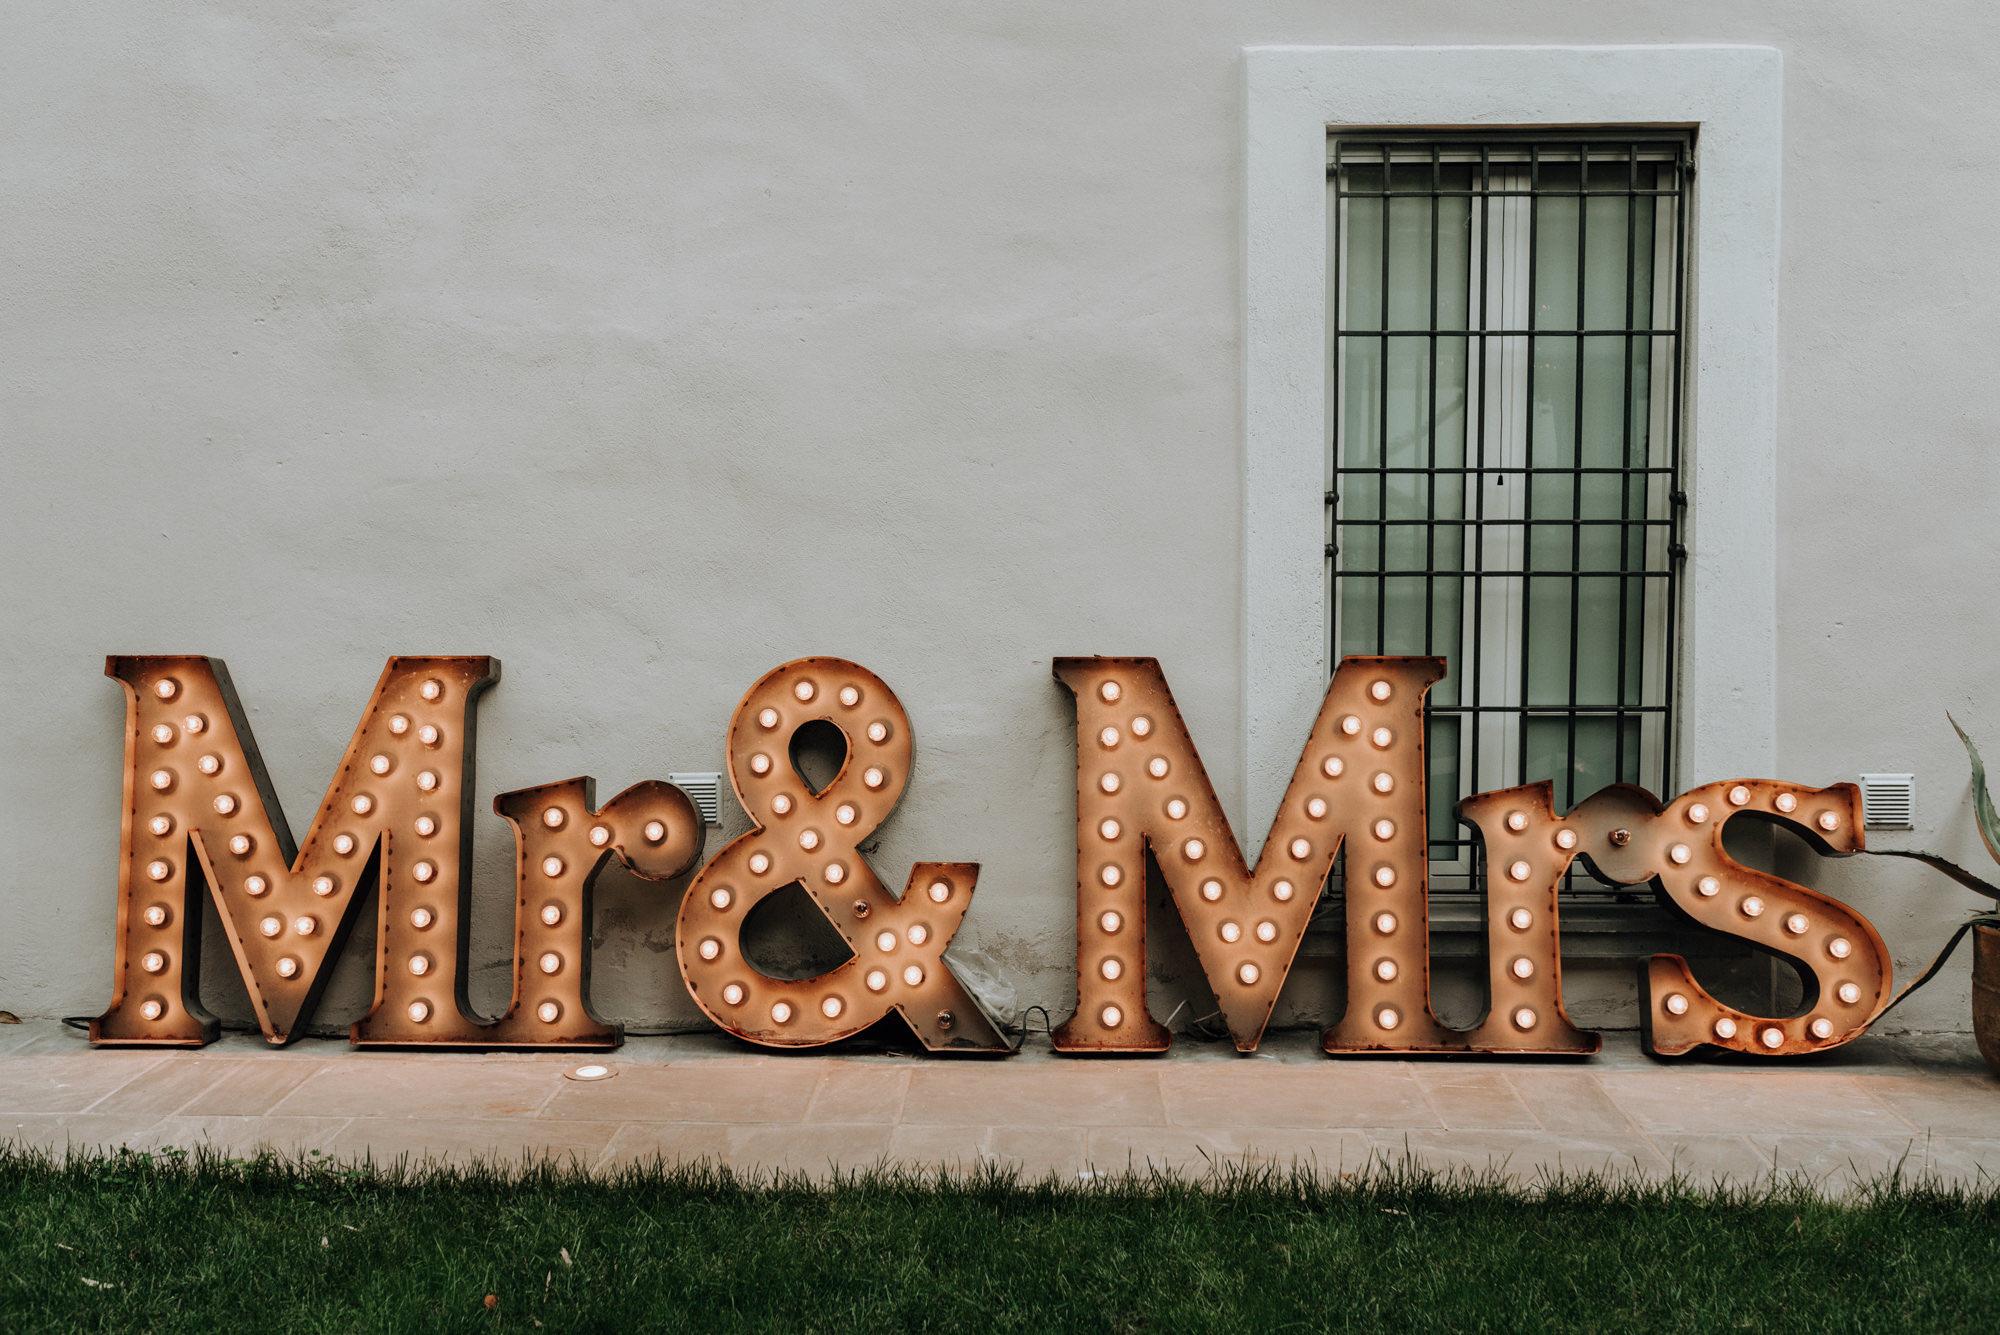 FOTO+PHOTO+BODA+WEDDING+ITALIA+ITALY+MAURICIO+GARAY+MAURICIOGARAY+WEDDINPHOTOGRAPHER+FOTOGRAFODEBODA-1560.jpg